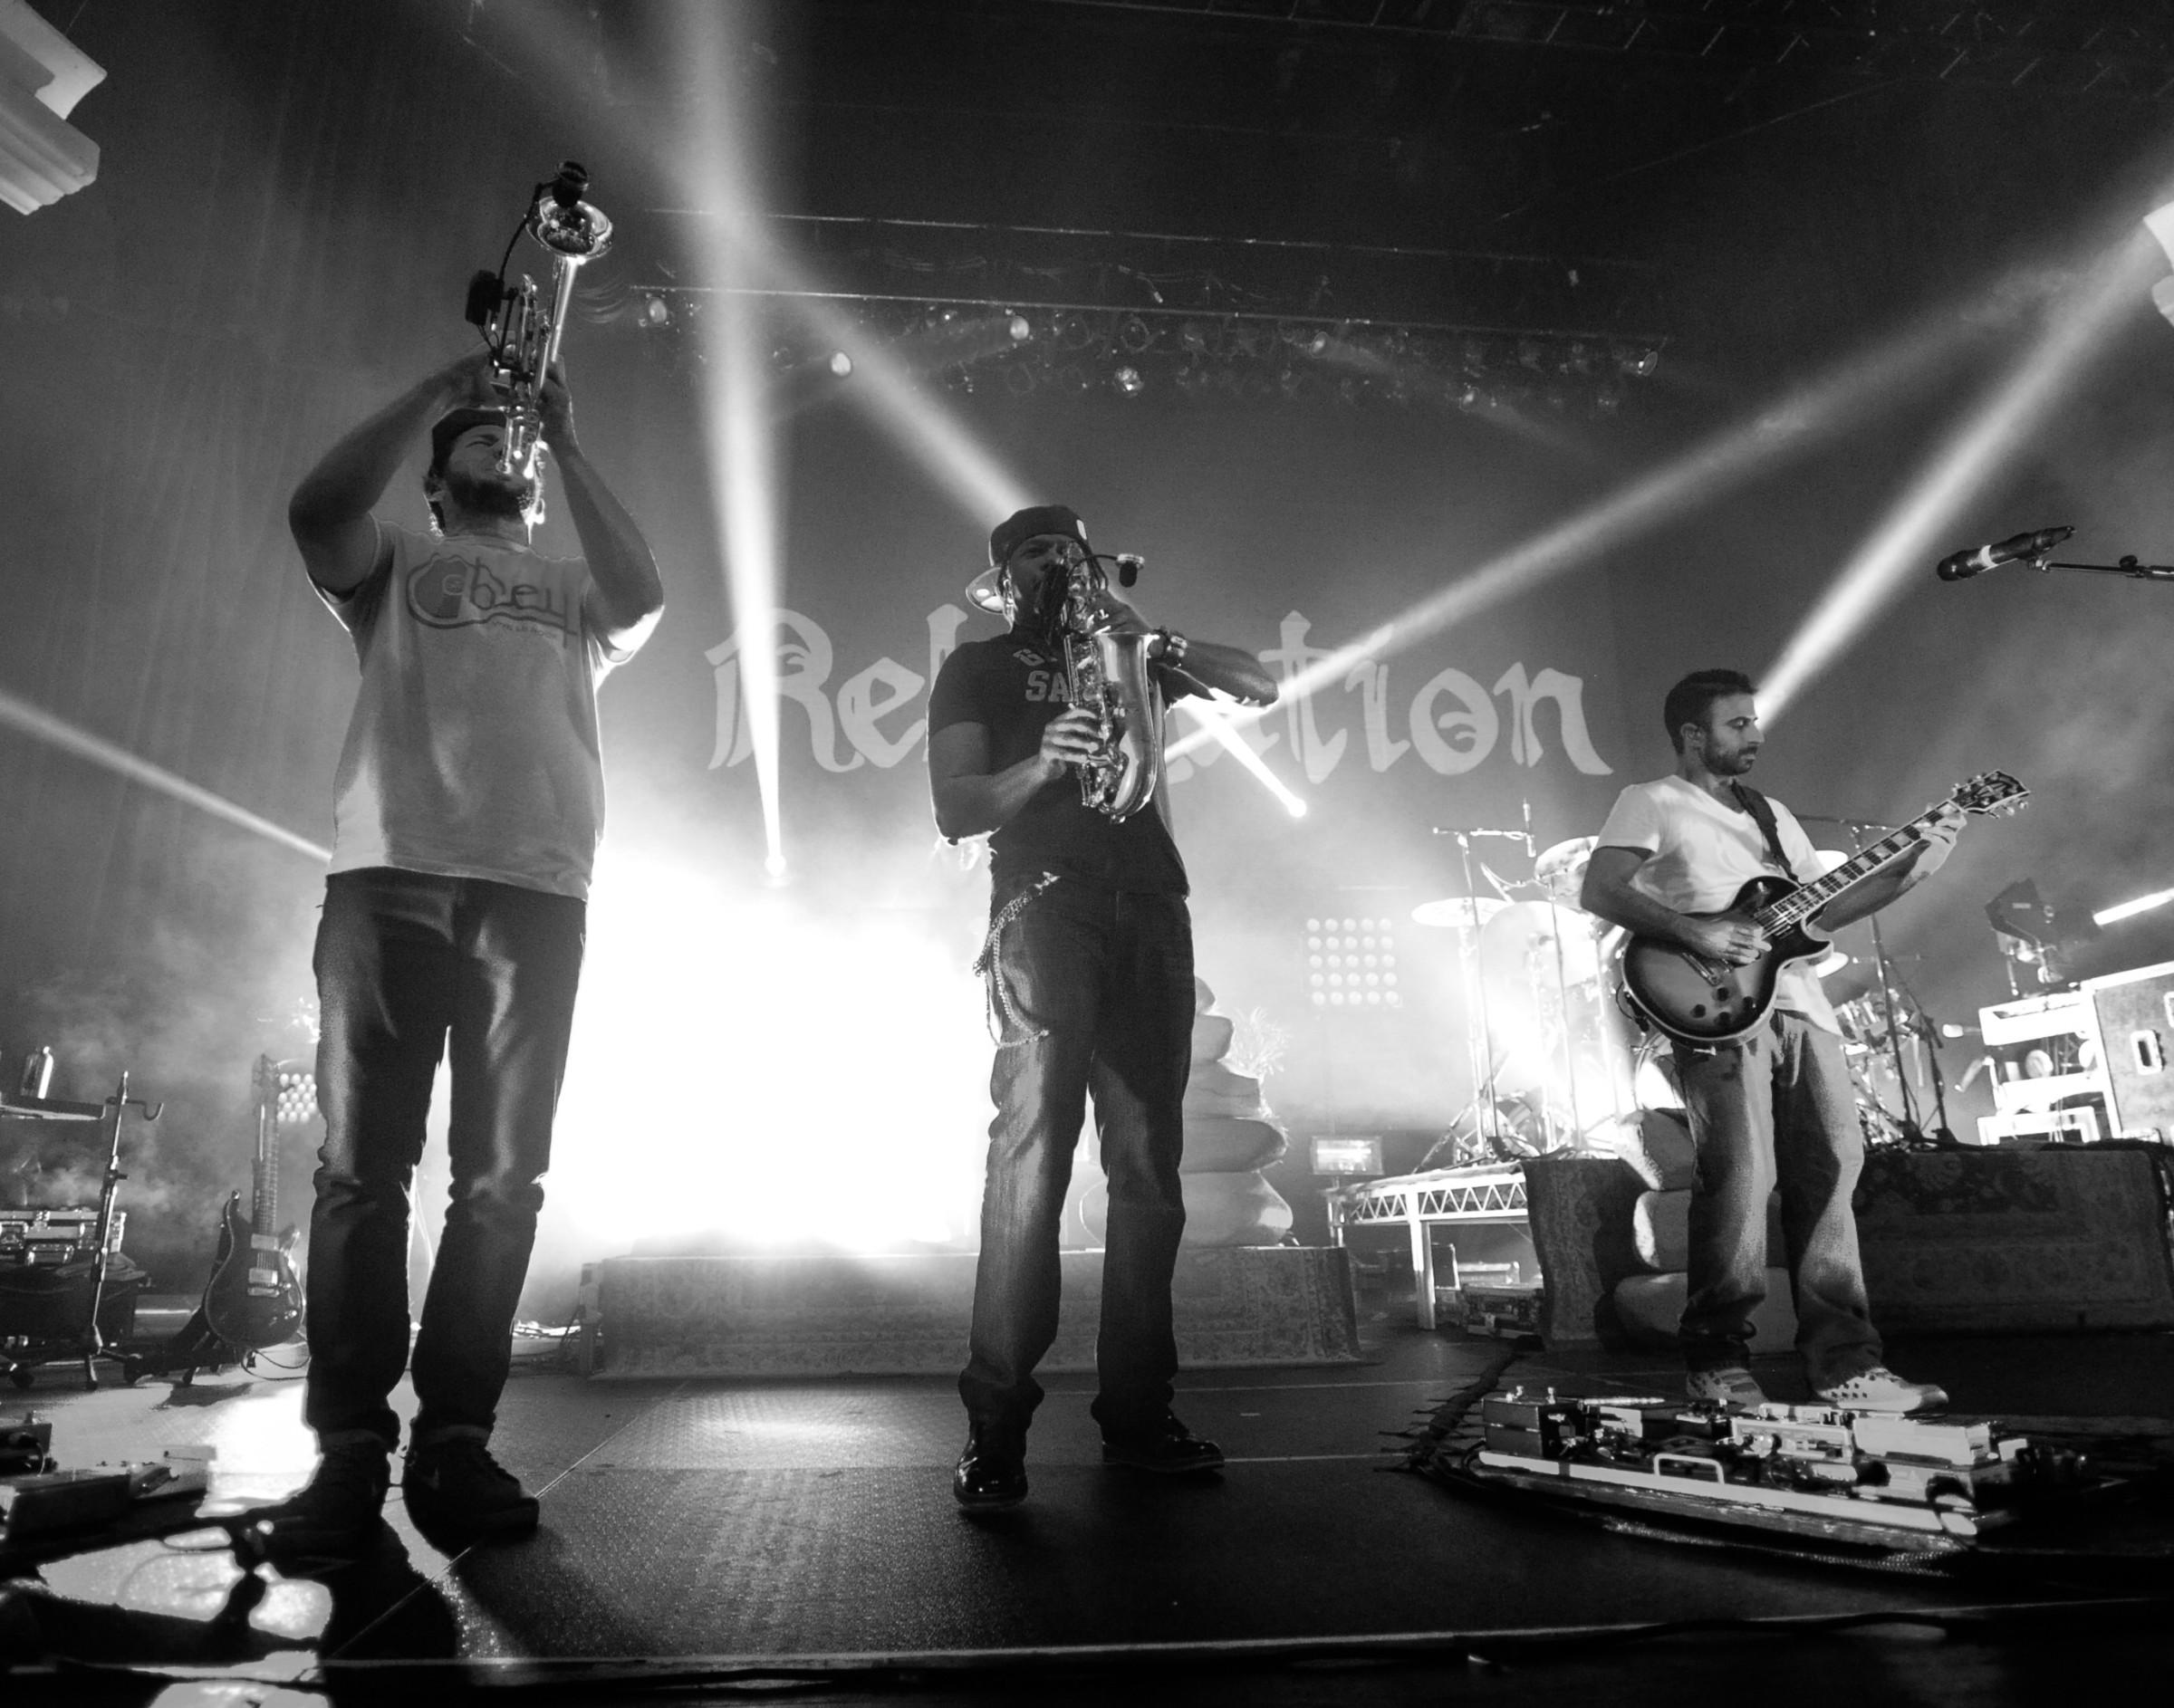 Rebelution @ Hollywood Palladium © Tristan Bellisimo